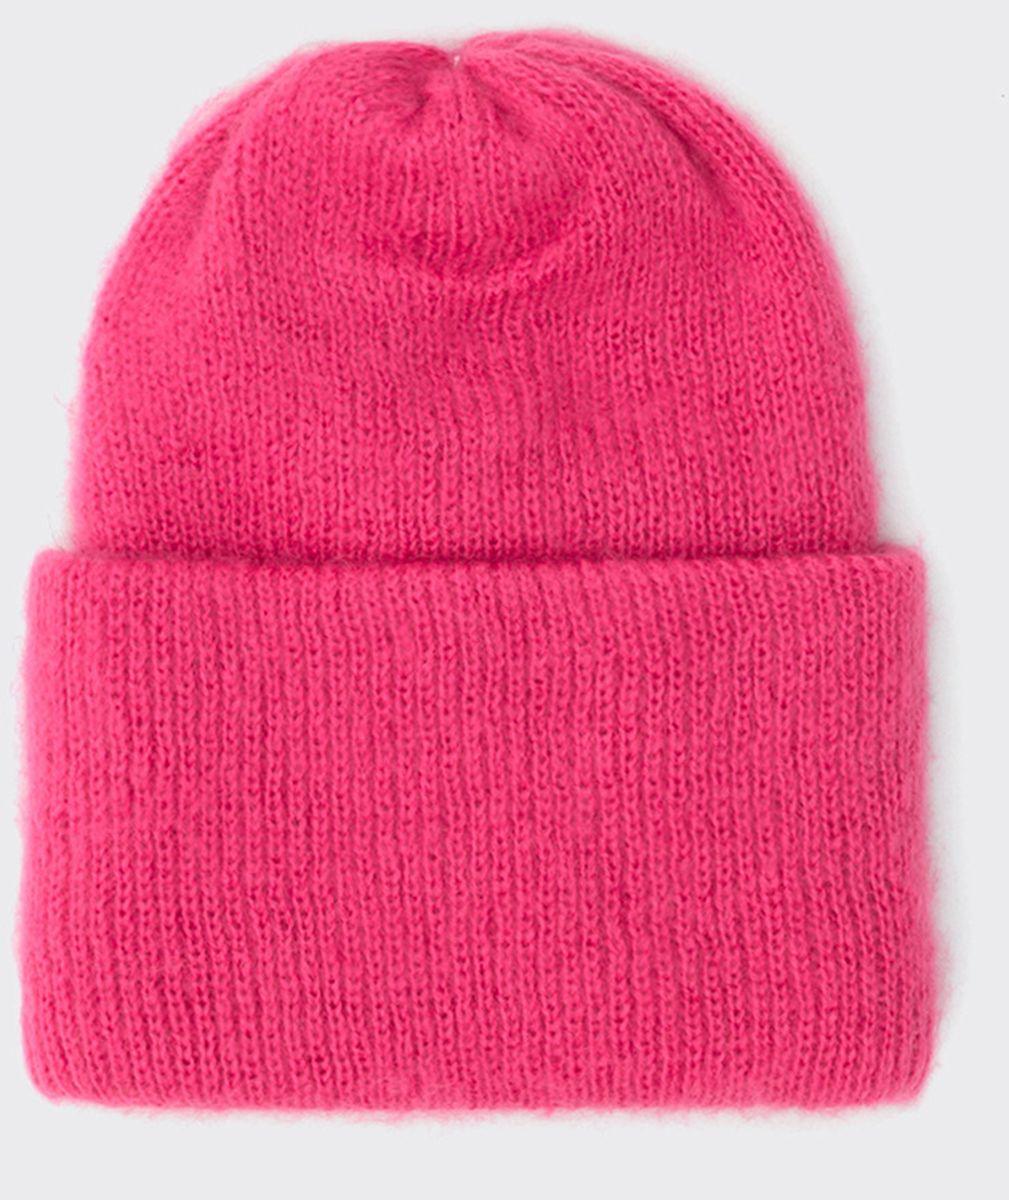 Шапка Concept Club шапка женская concept club ivon цвет серый 10206400095 1900 размер 56